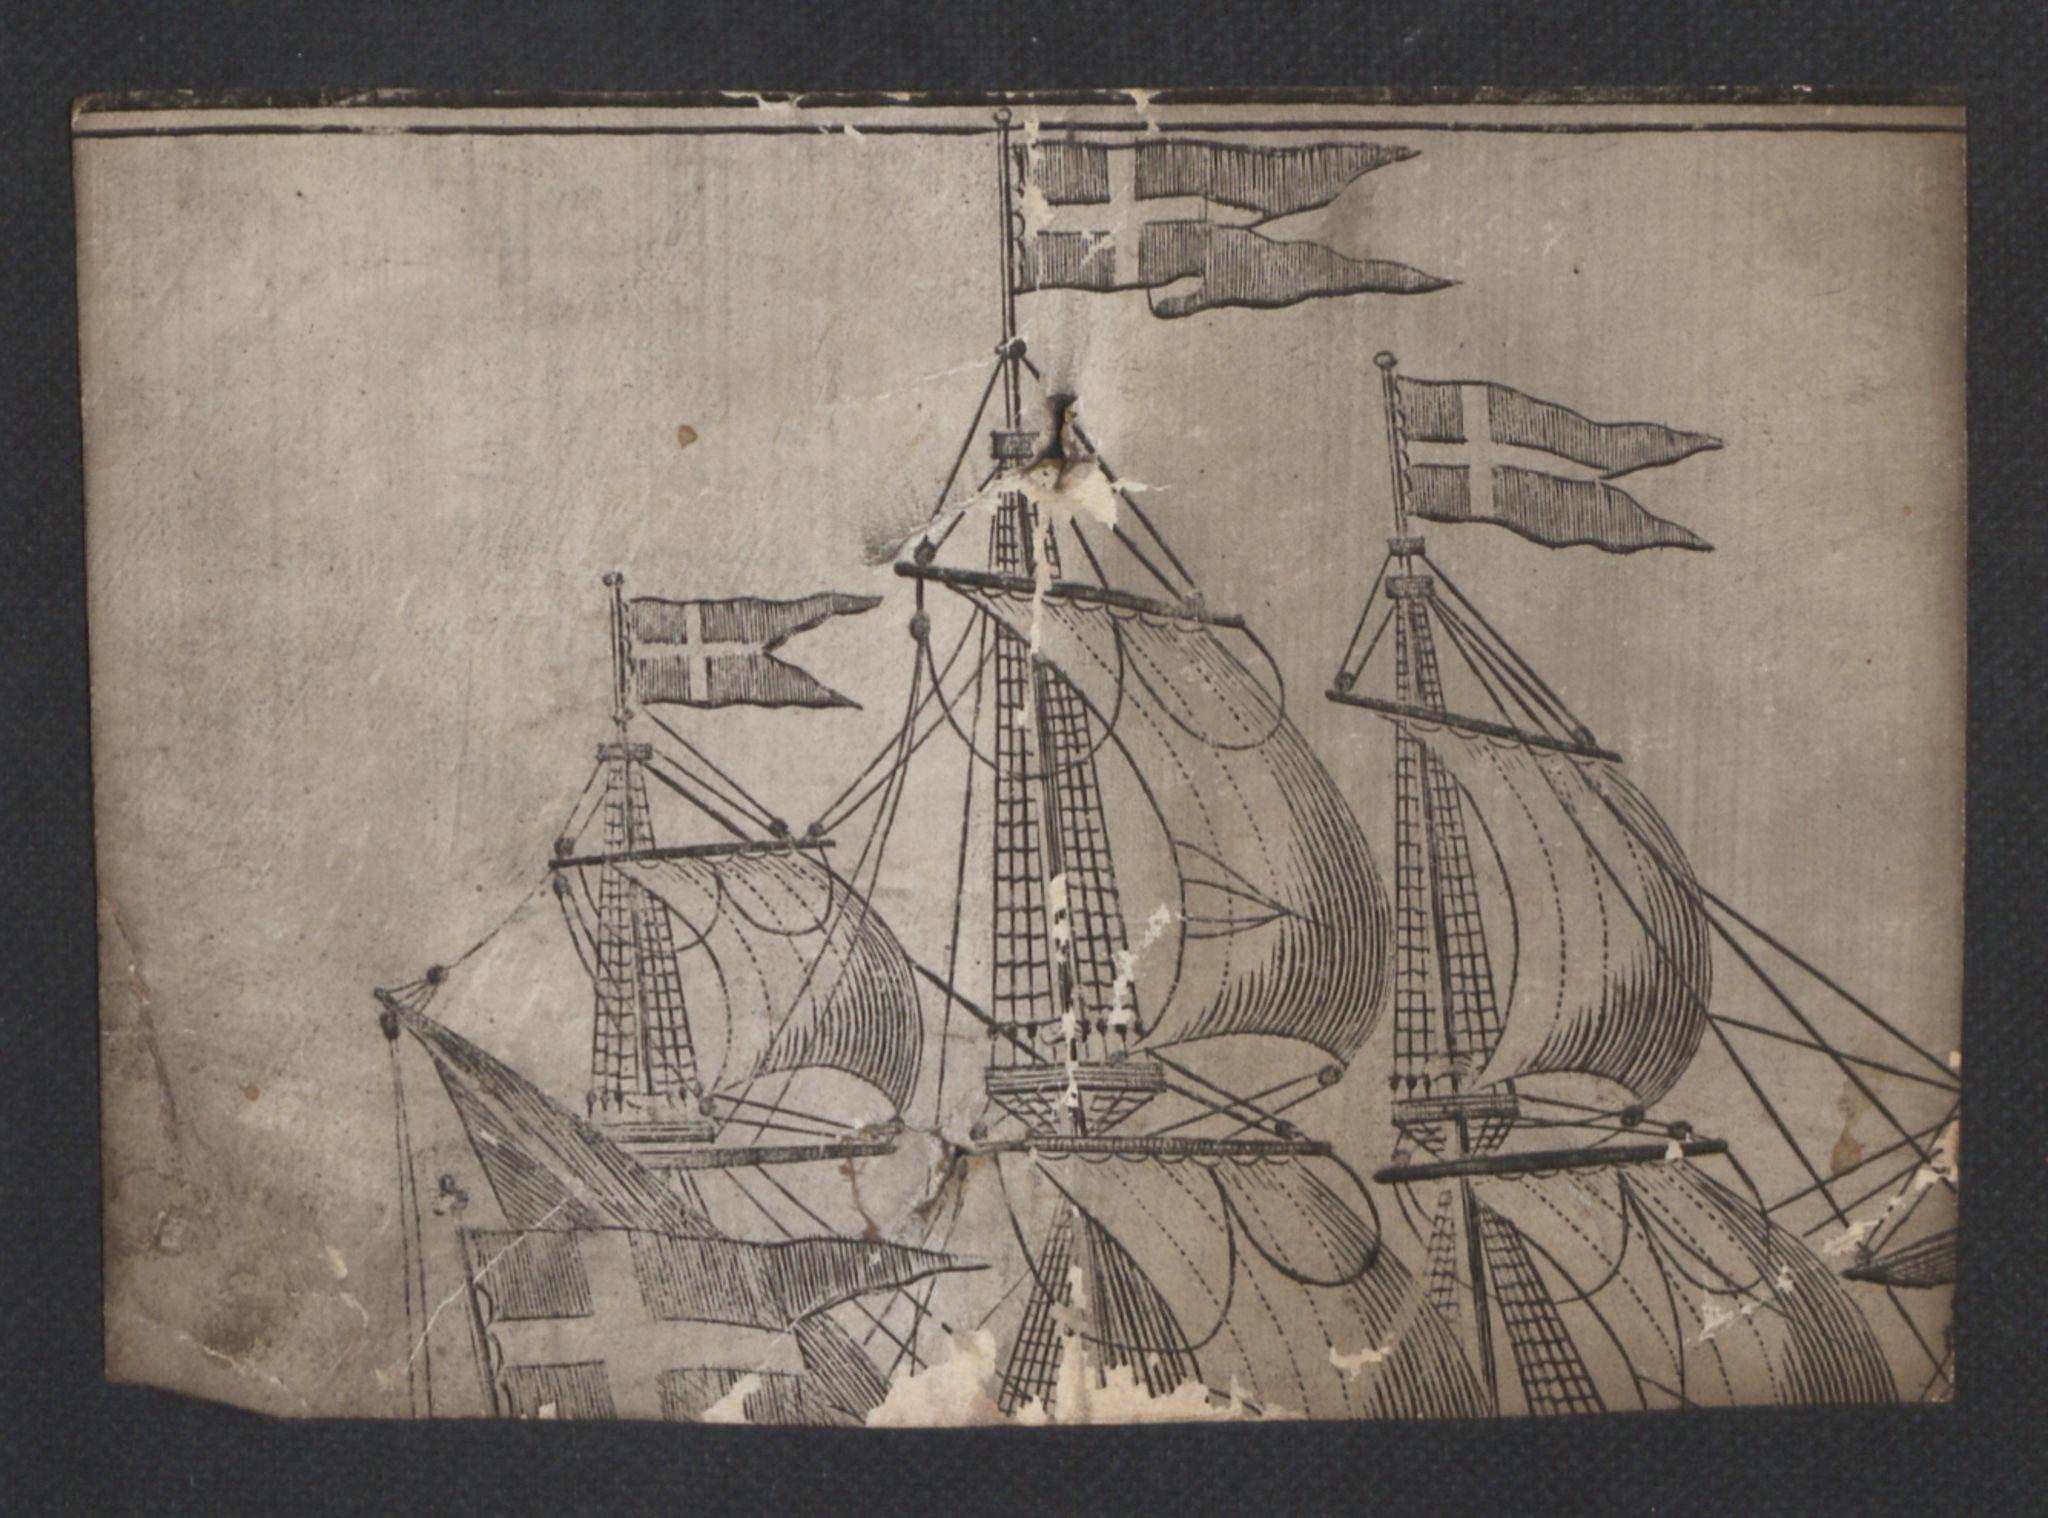 RA, Kommersekollegiet, Brannforsikringskontoret 1767-1814, F/Fa/L0008: Bragernes, 1765-1797